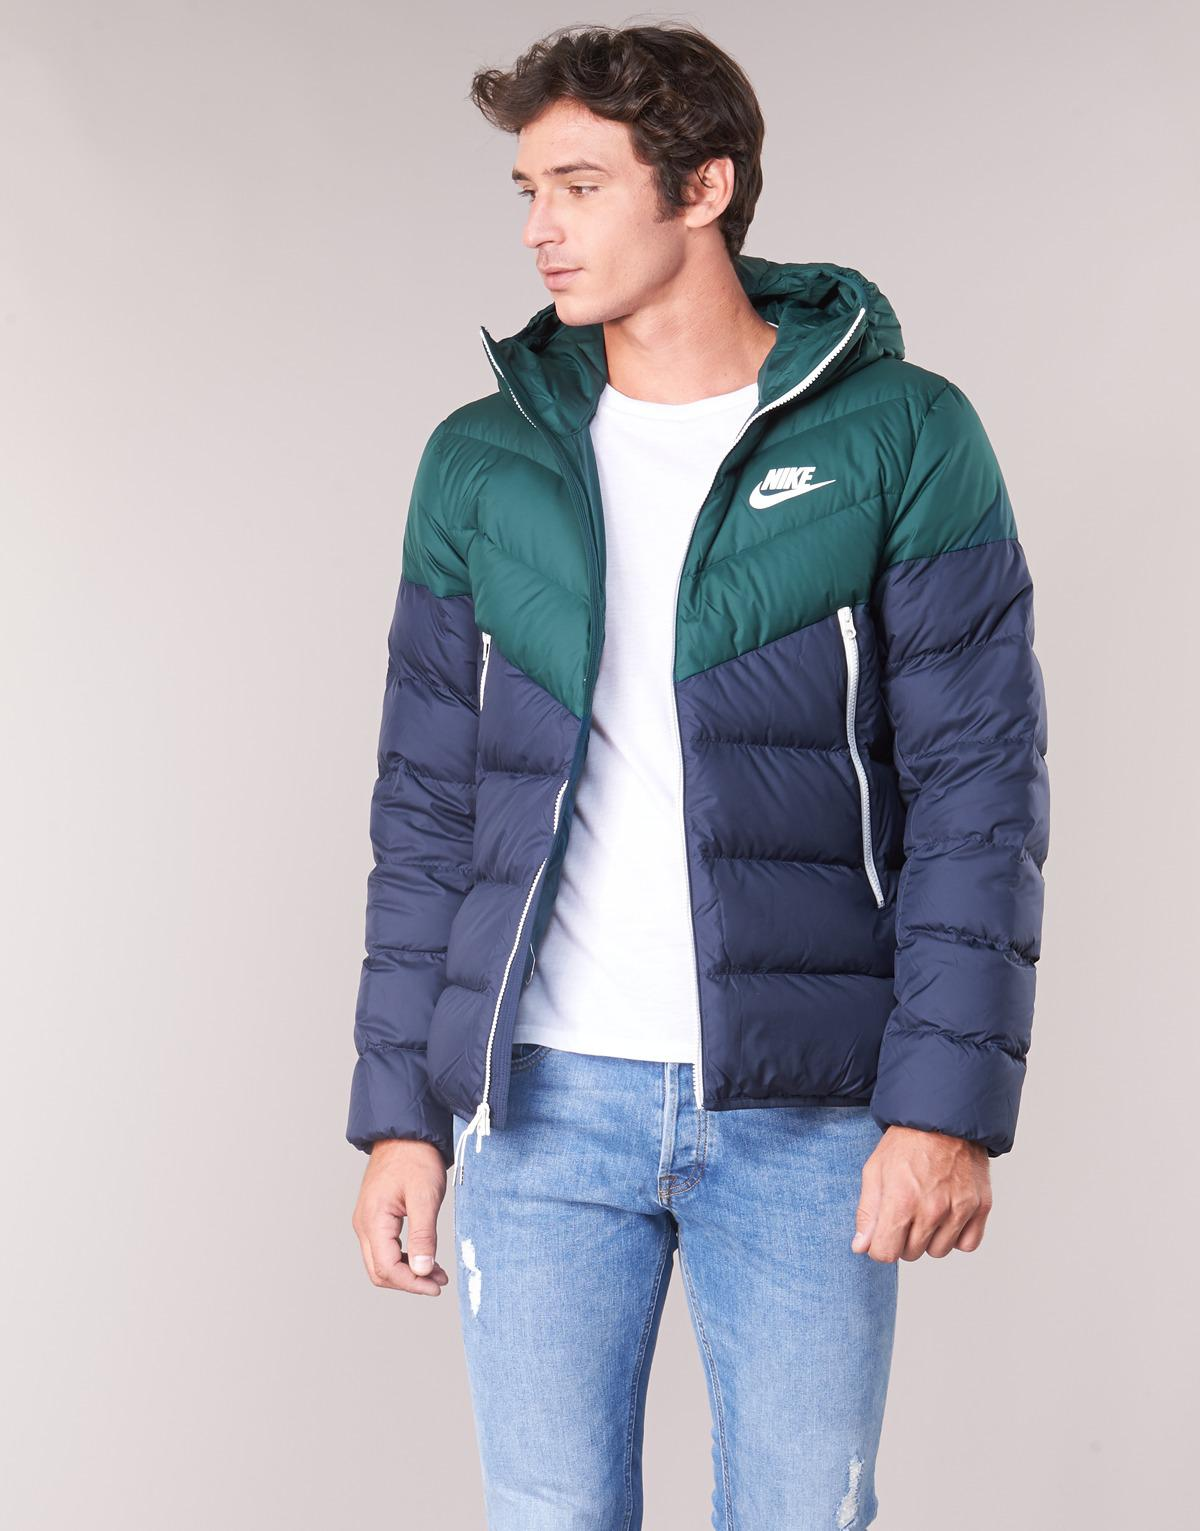 5ca08c7477 Nike Sportup Jacket in Blue for Men - Lyst